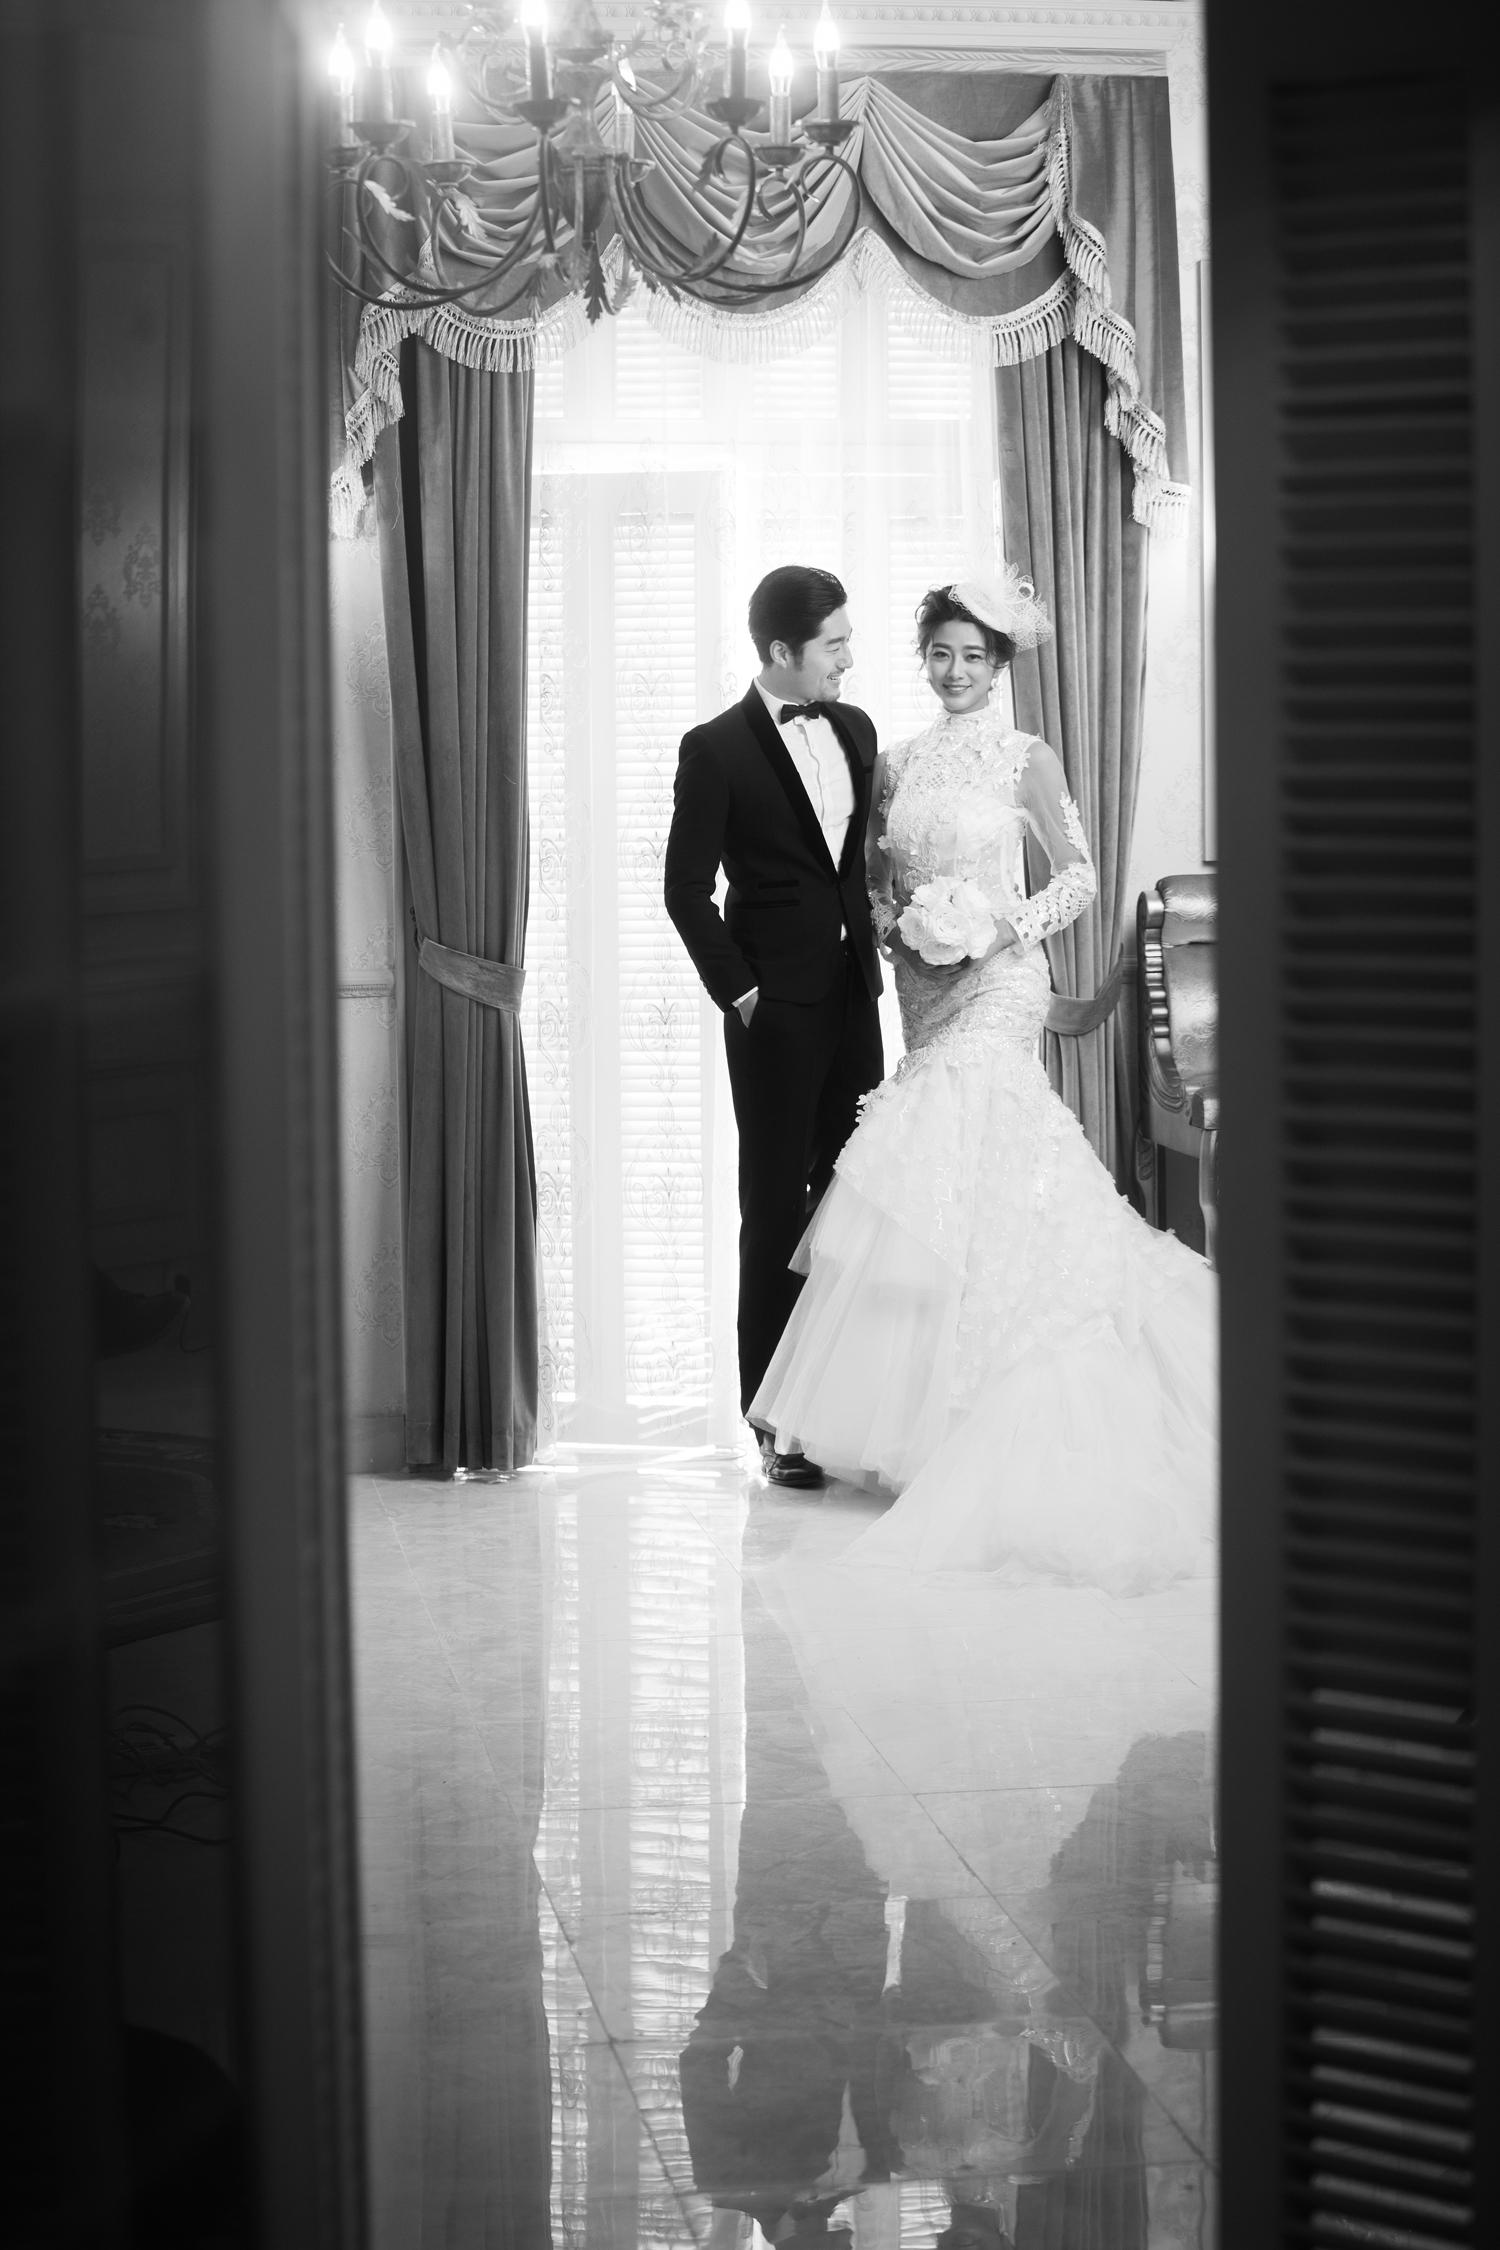 结婚纪�y��yd�&����_星空婚礼布置,婚礼布置图库,婚礼纪www.hunliji.com